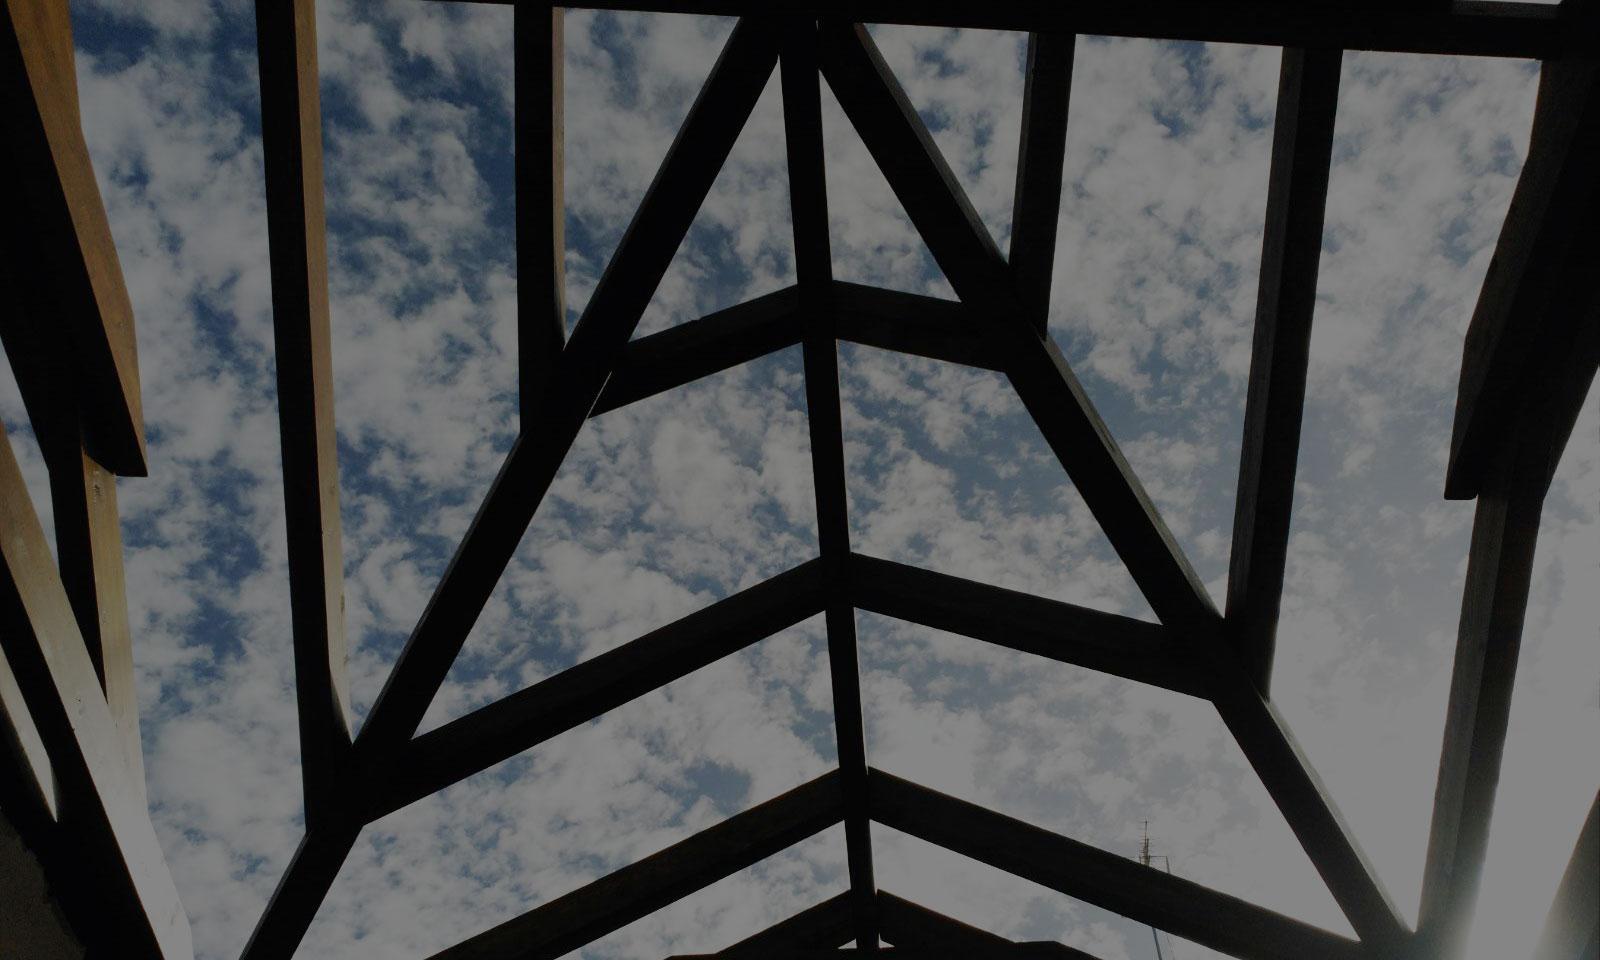 estructuras de madera DLC